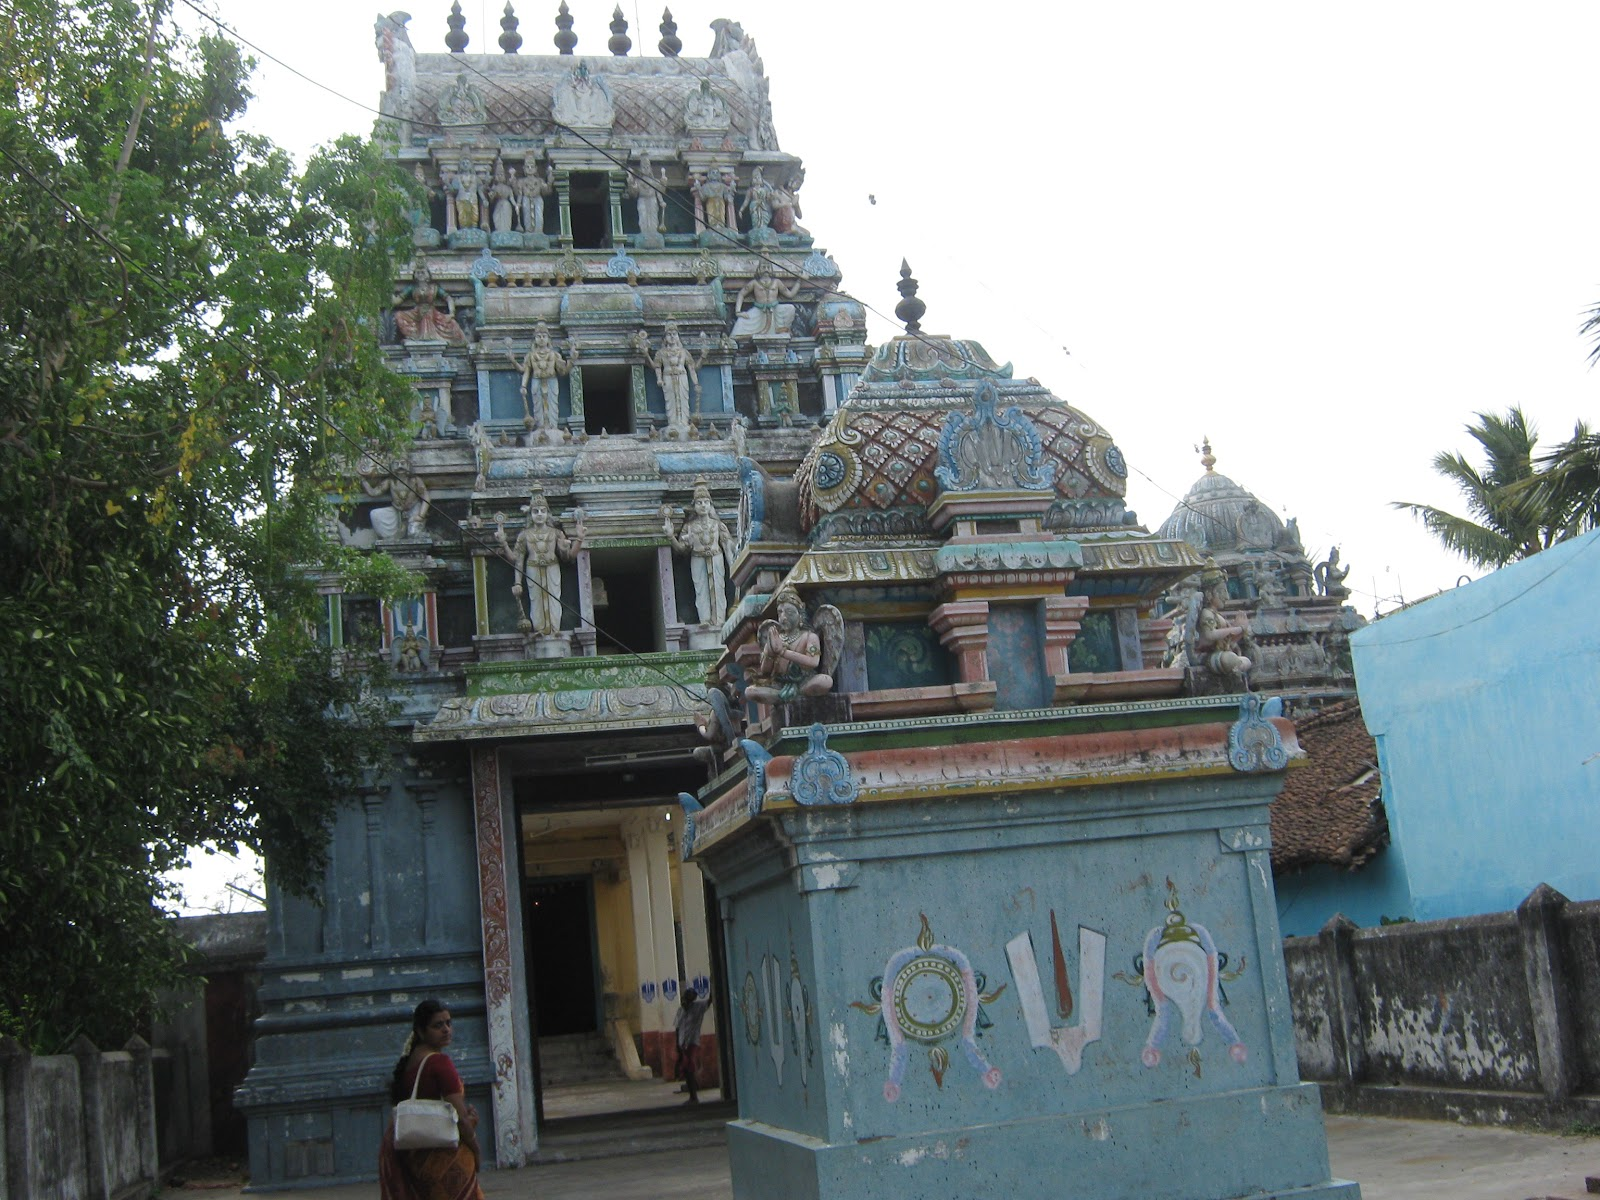 Sri Deivanayaga Perumal Temple (Thiru Devanar Thogai) Seerkazhi - Divya Desam 36